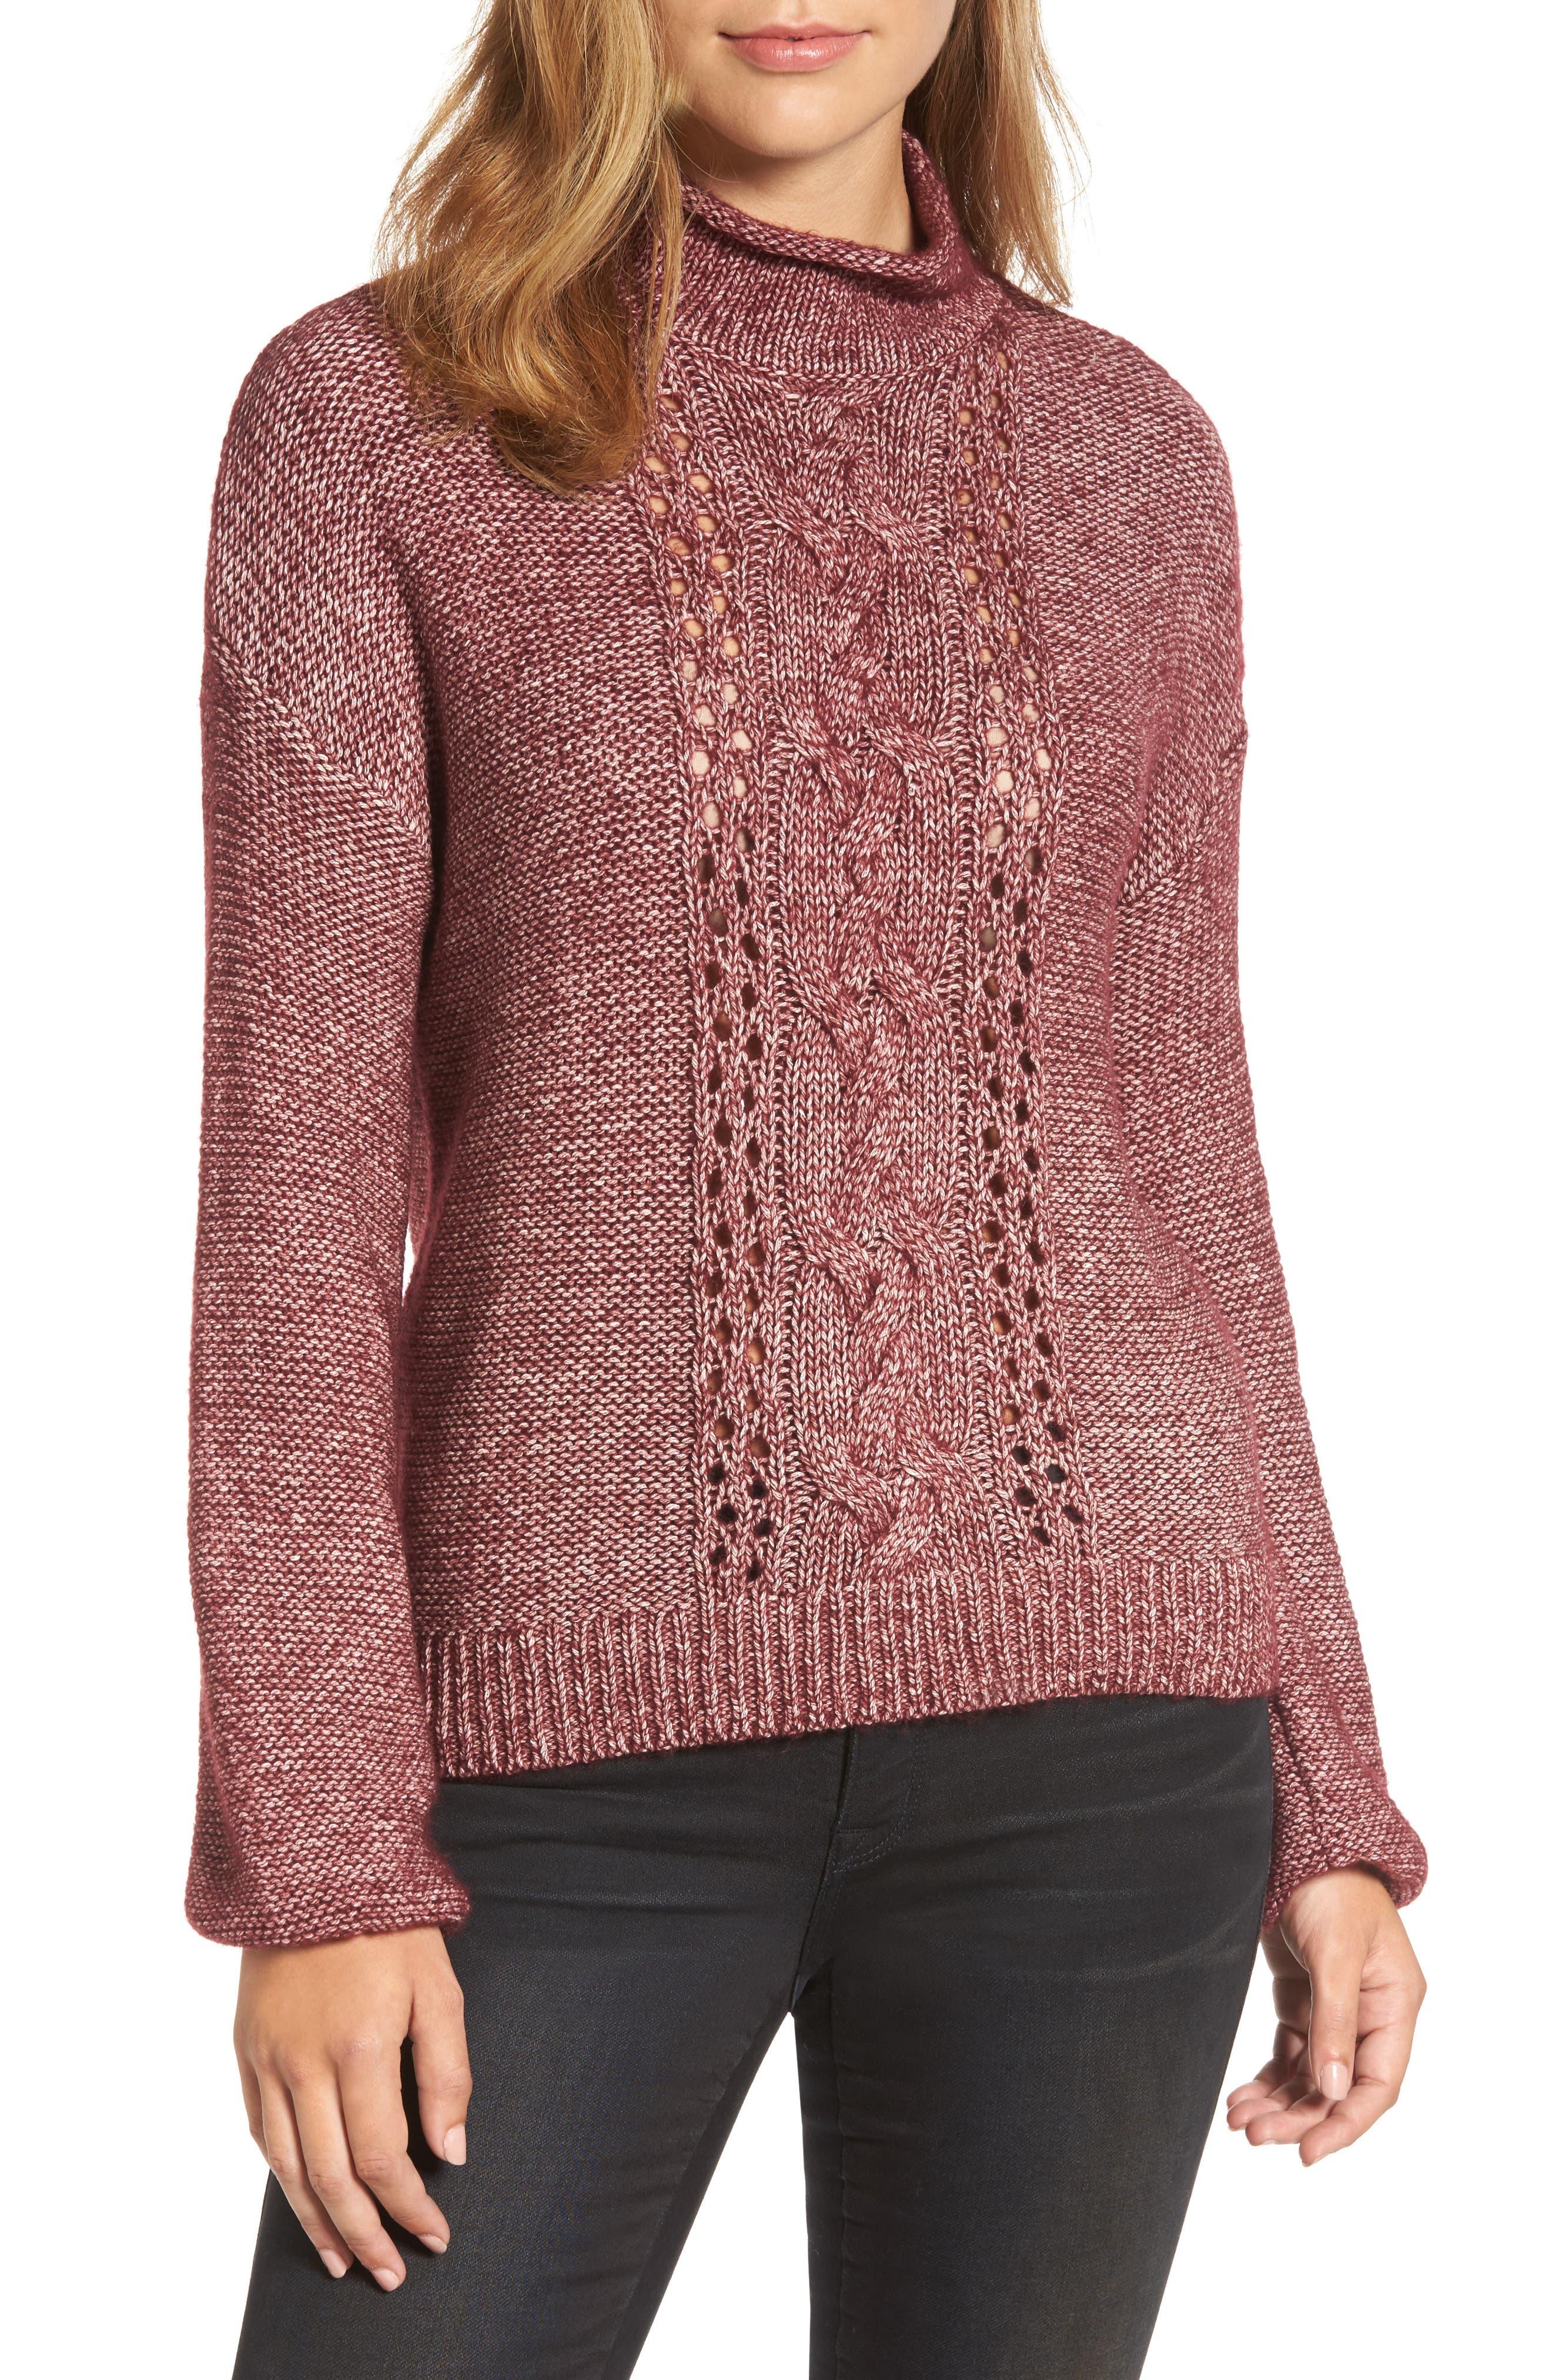 Main Image - Caslon® Open Cable Knit Funnel Neck Sweater (Regular & Petite)